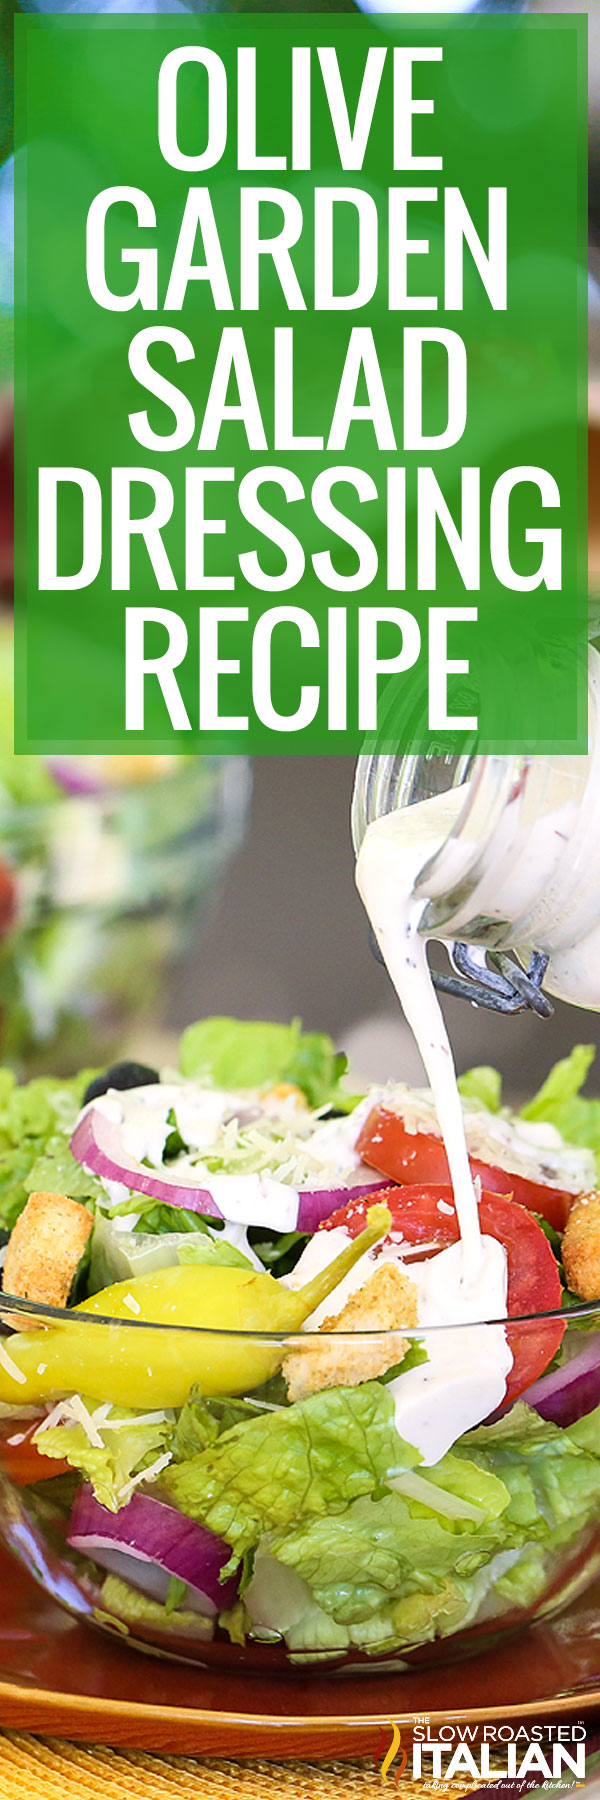 Olive Garden Salad Dressing Recipe closeup